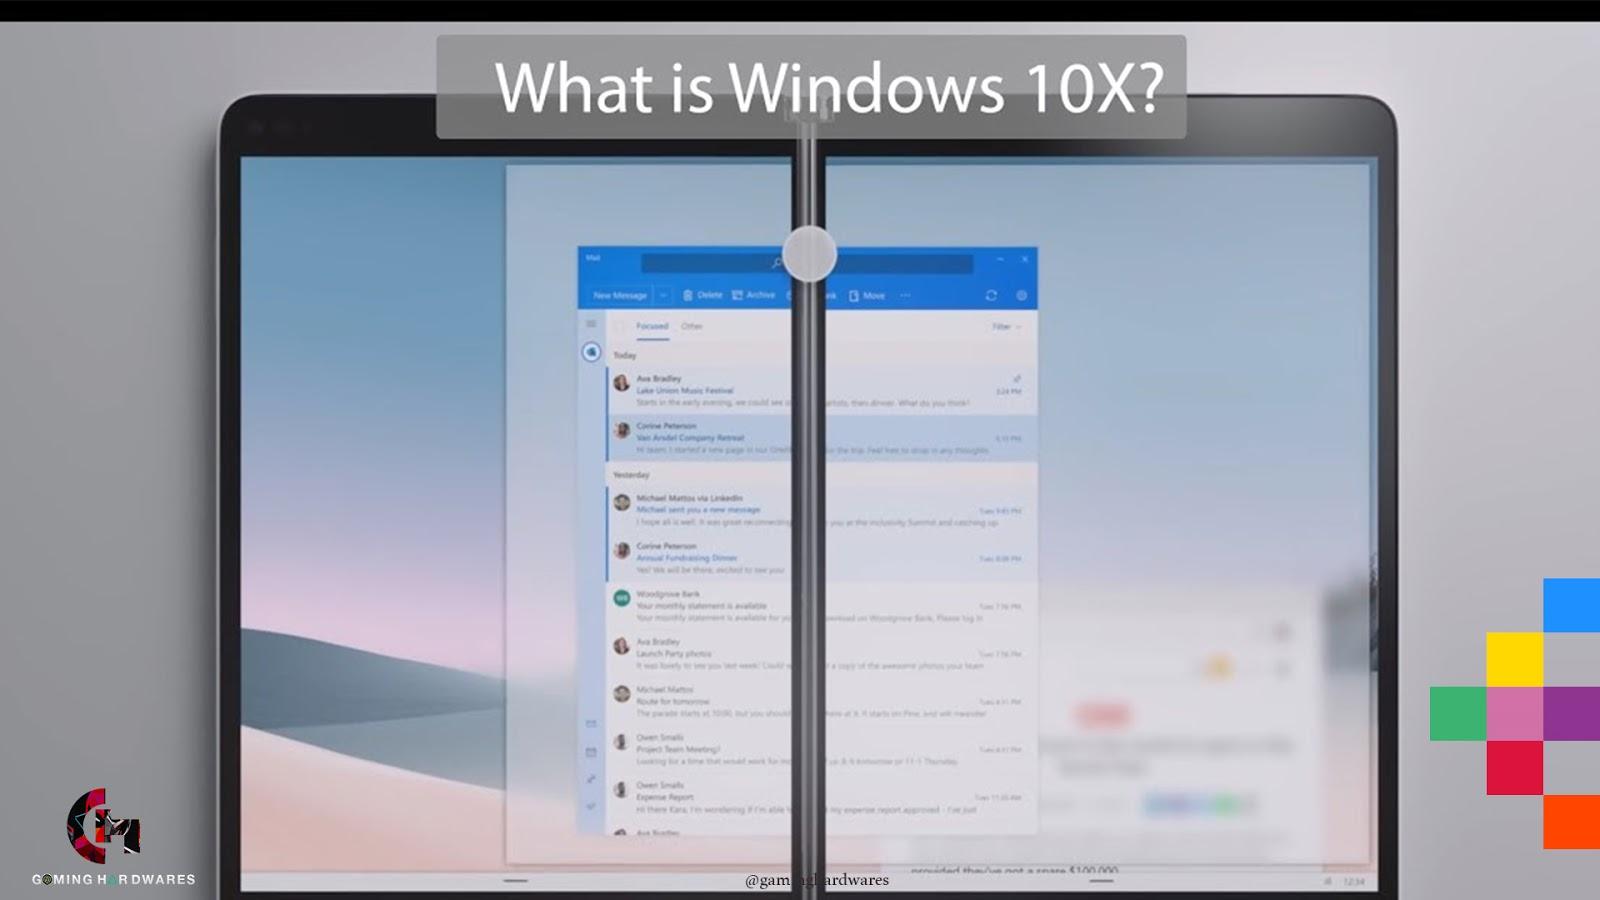 windows 10x release date